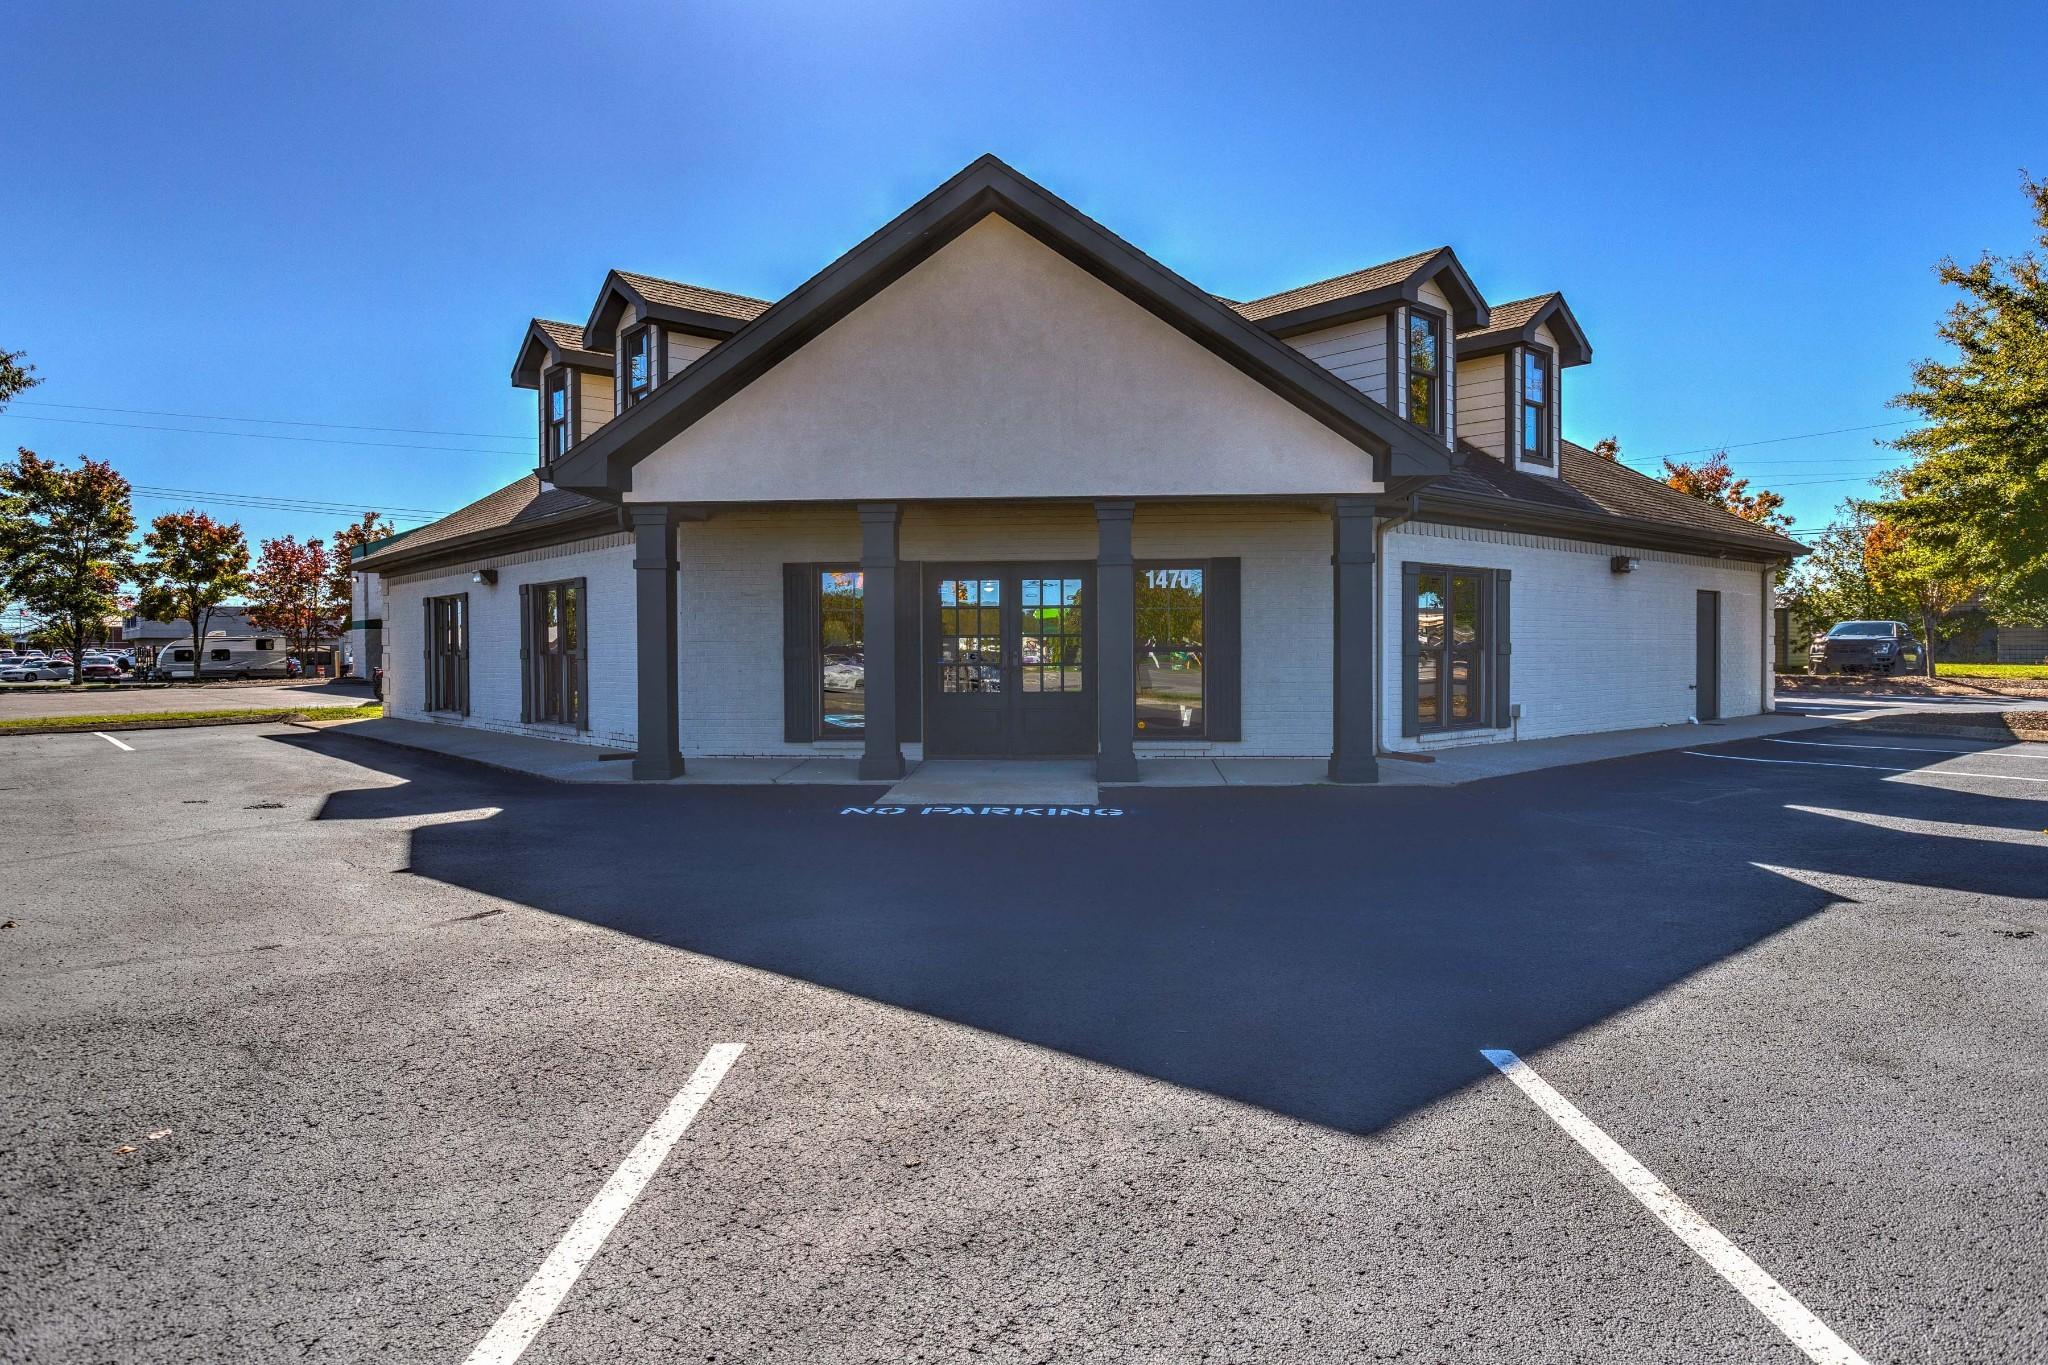 1470 S Church St Property Photo - Murfreesboro, TN real estate listing